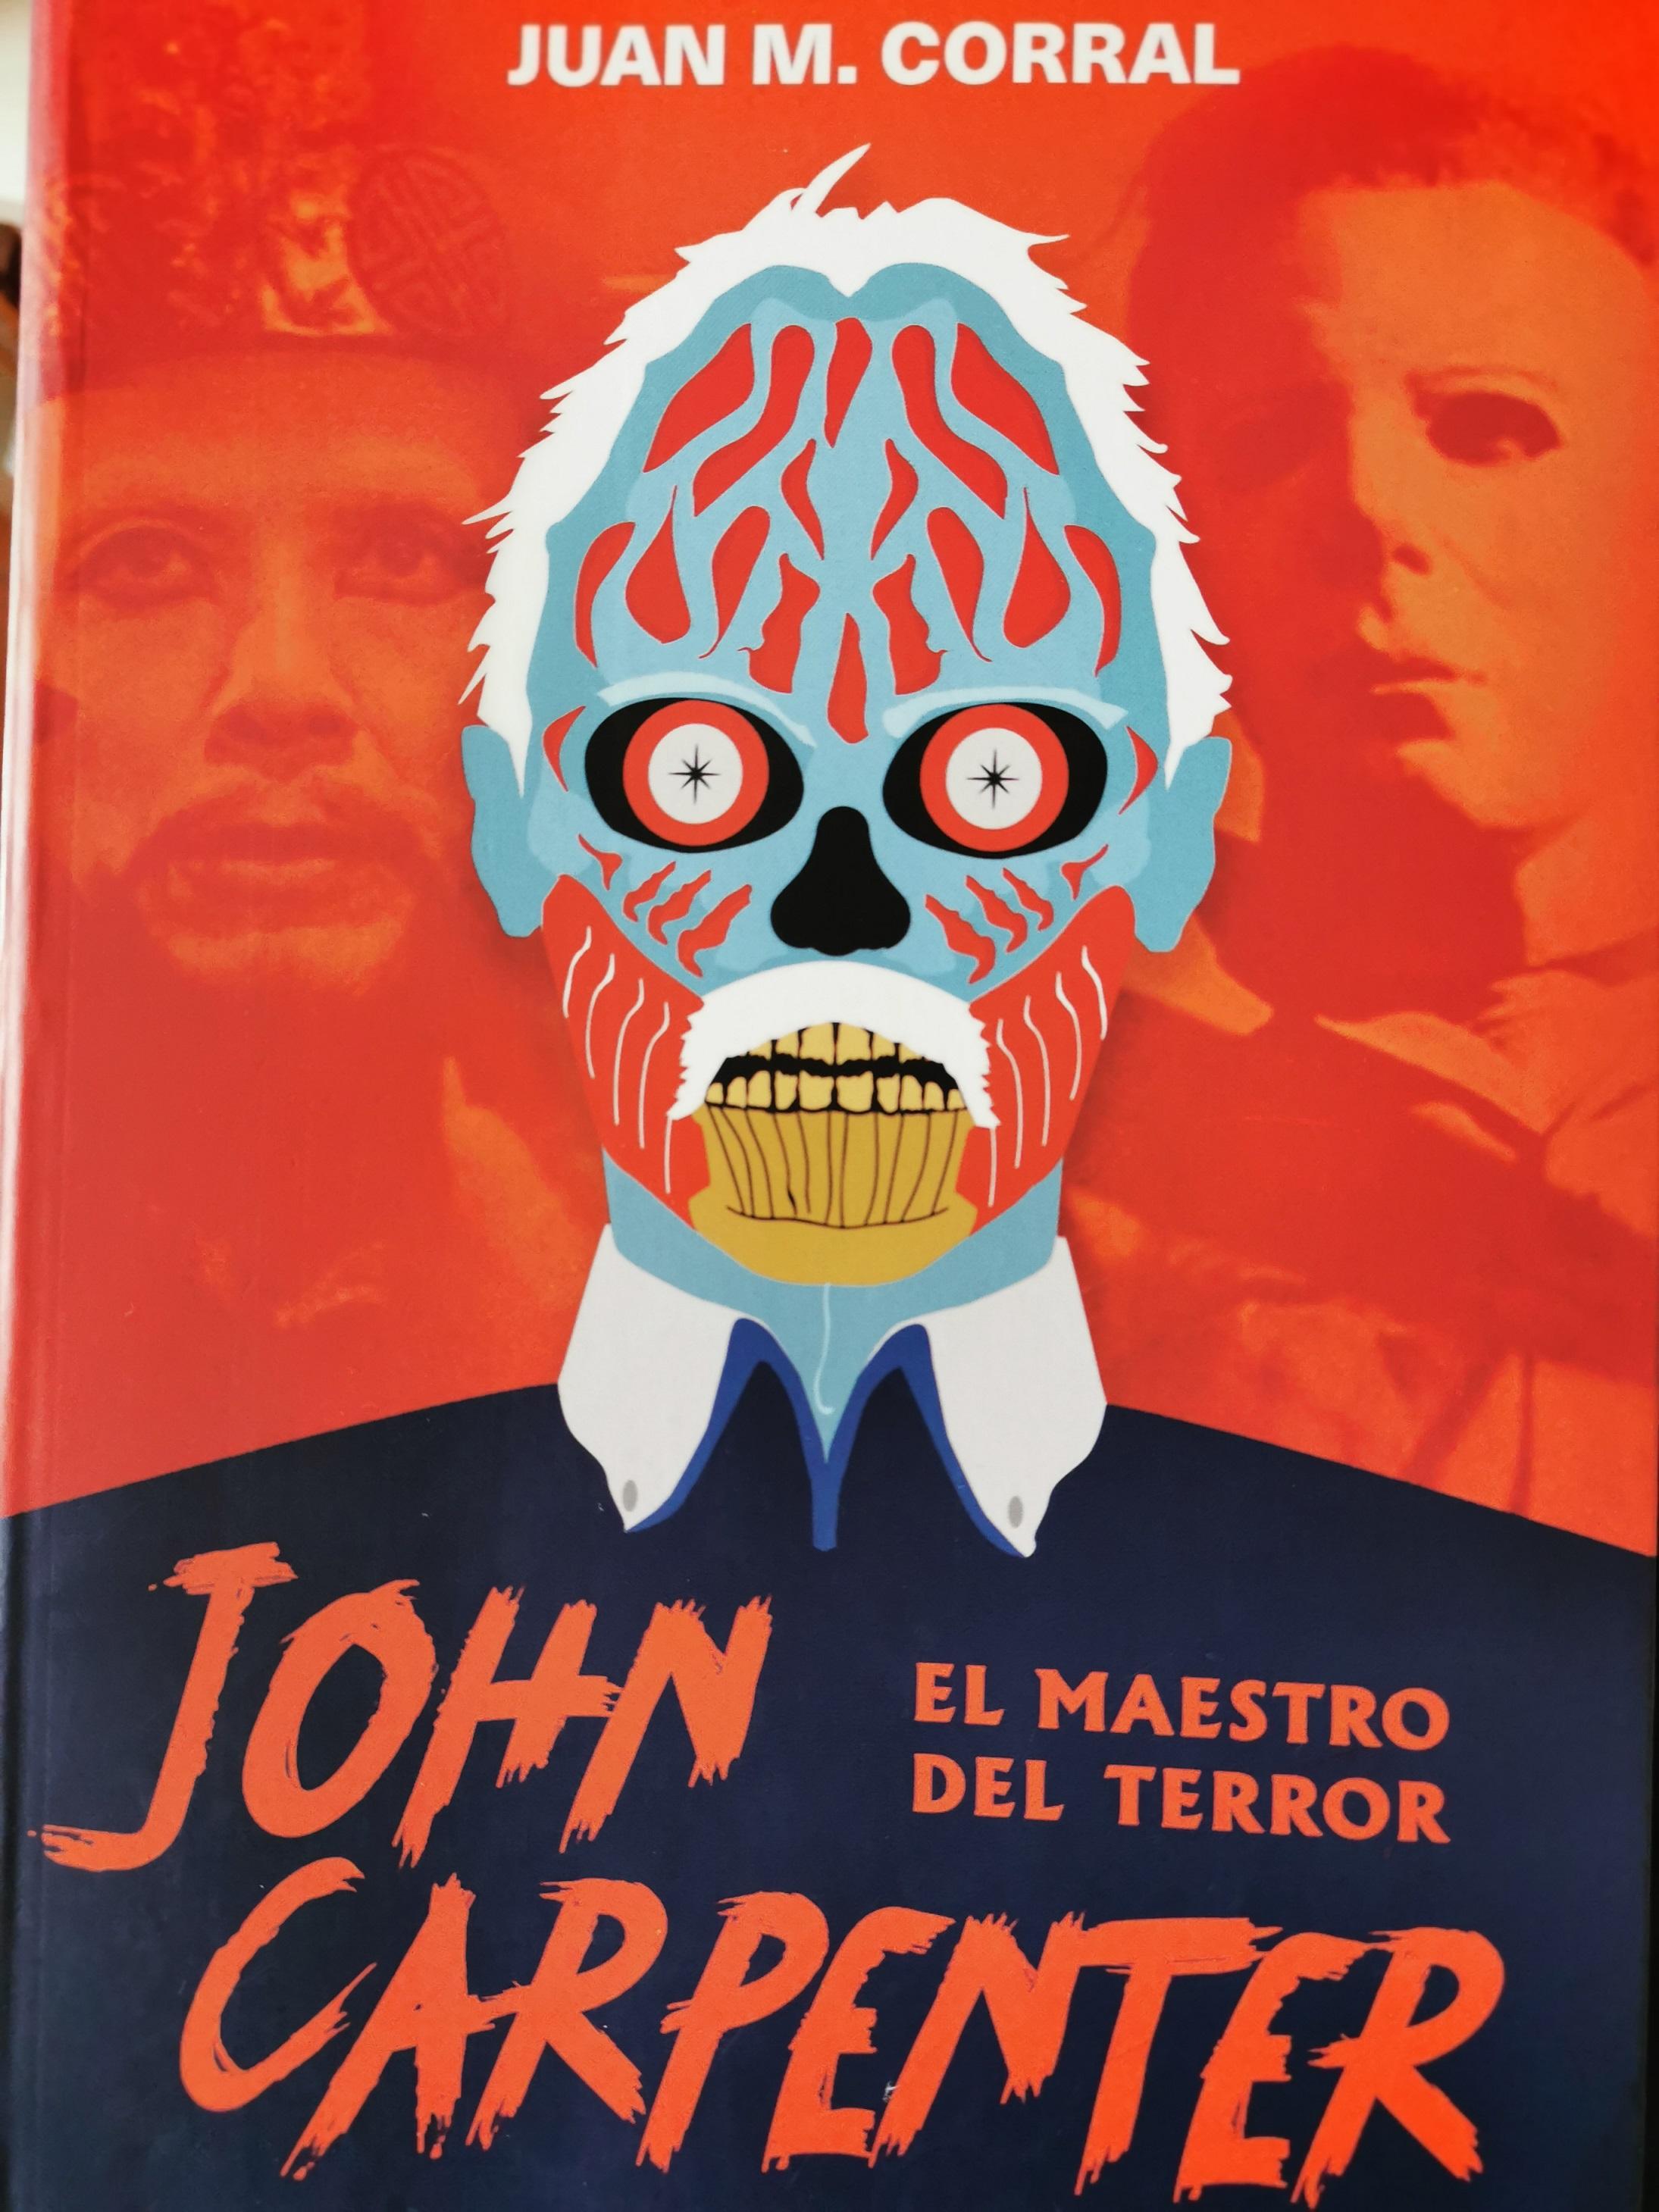 John Carpenter, el maestro del terror – Juan M. Corral